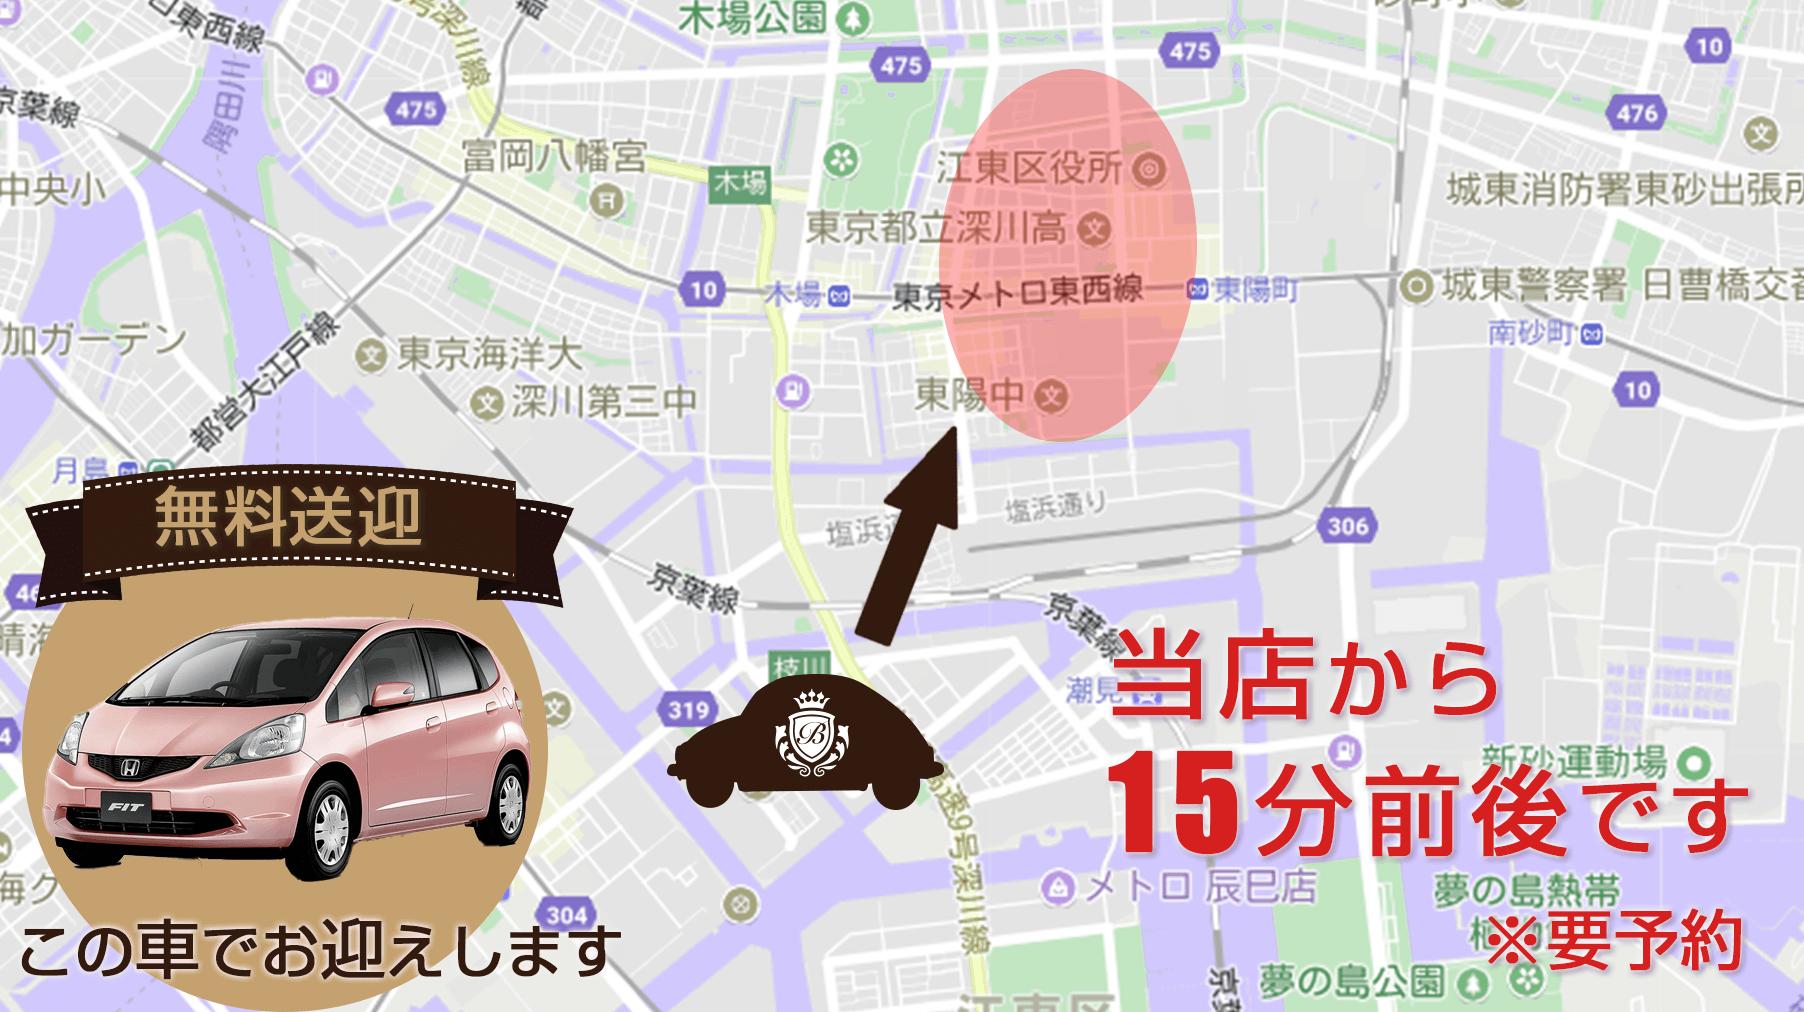 無料送迎地域【東陽町エリア】